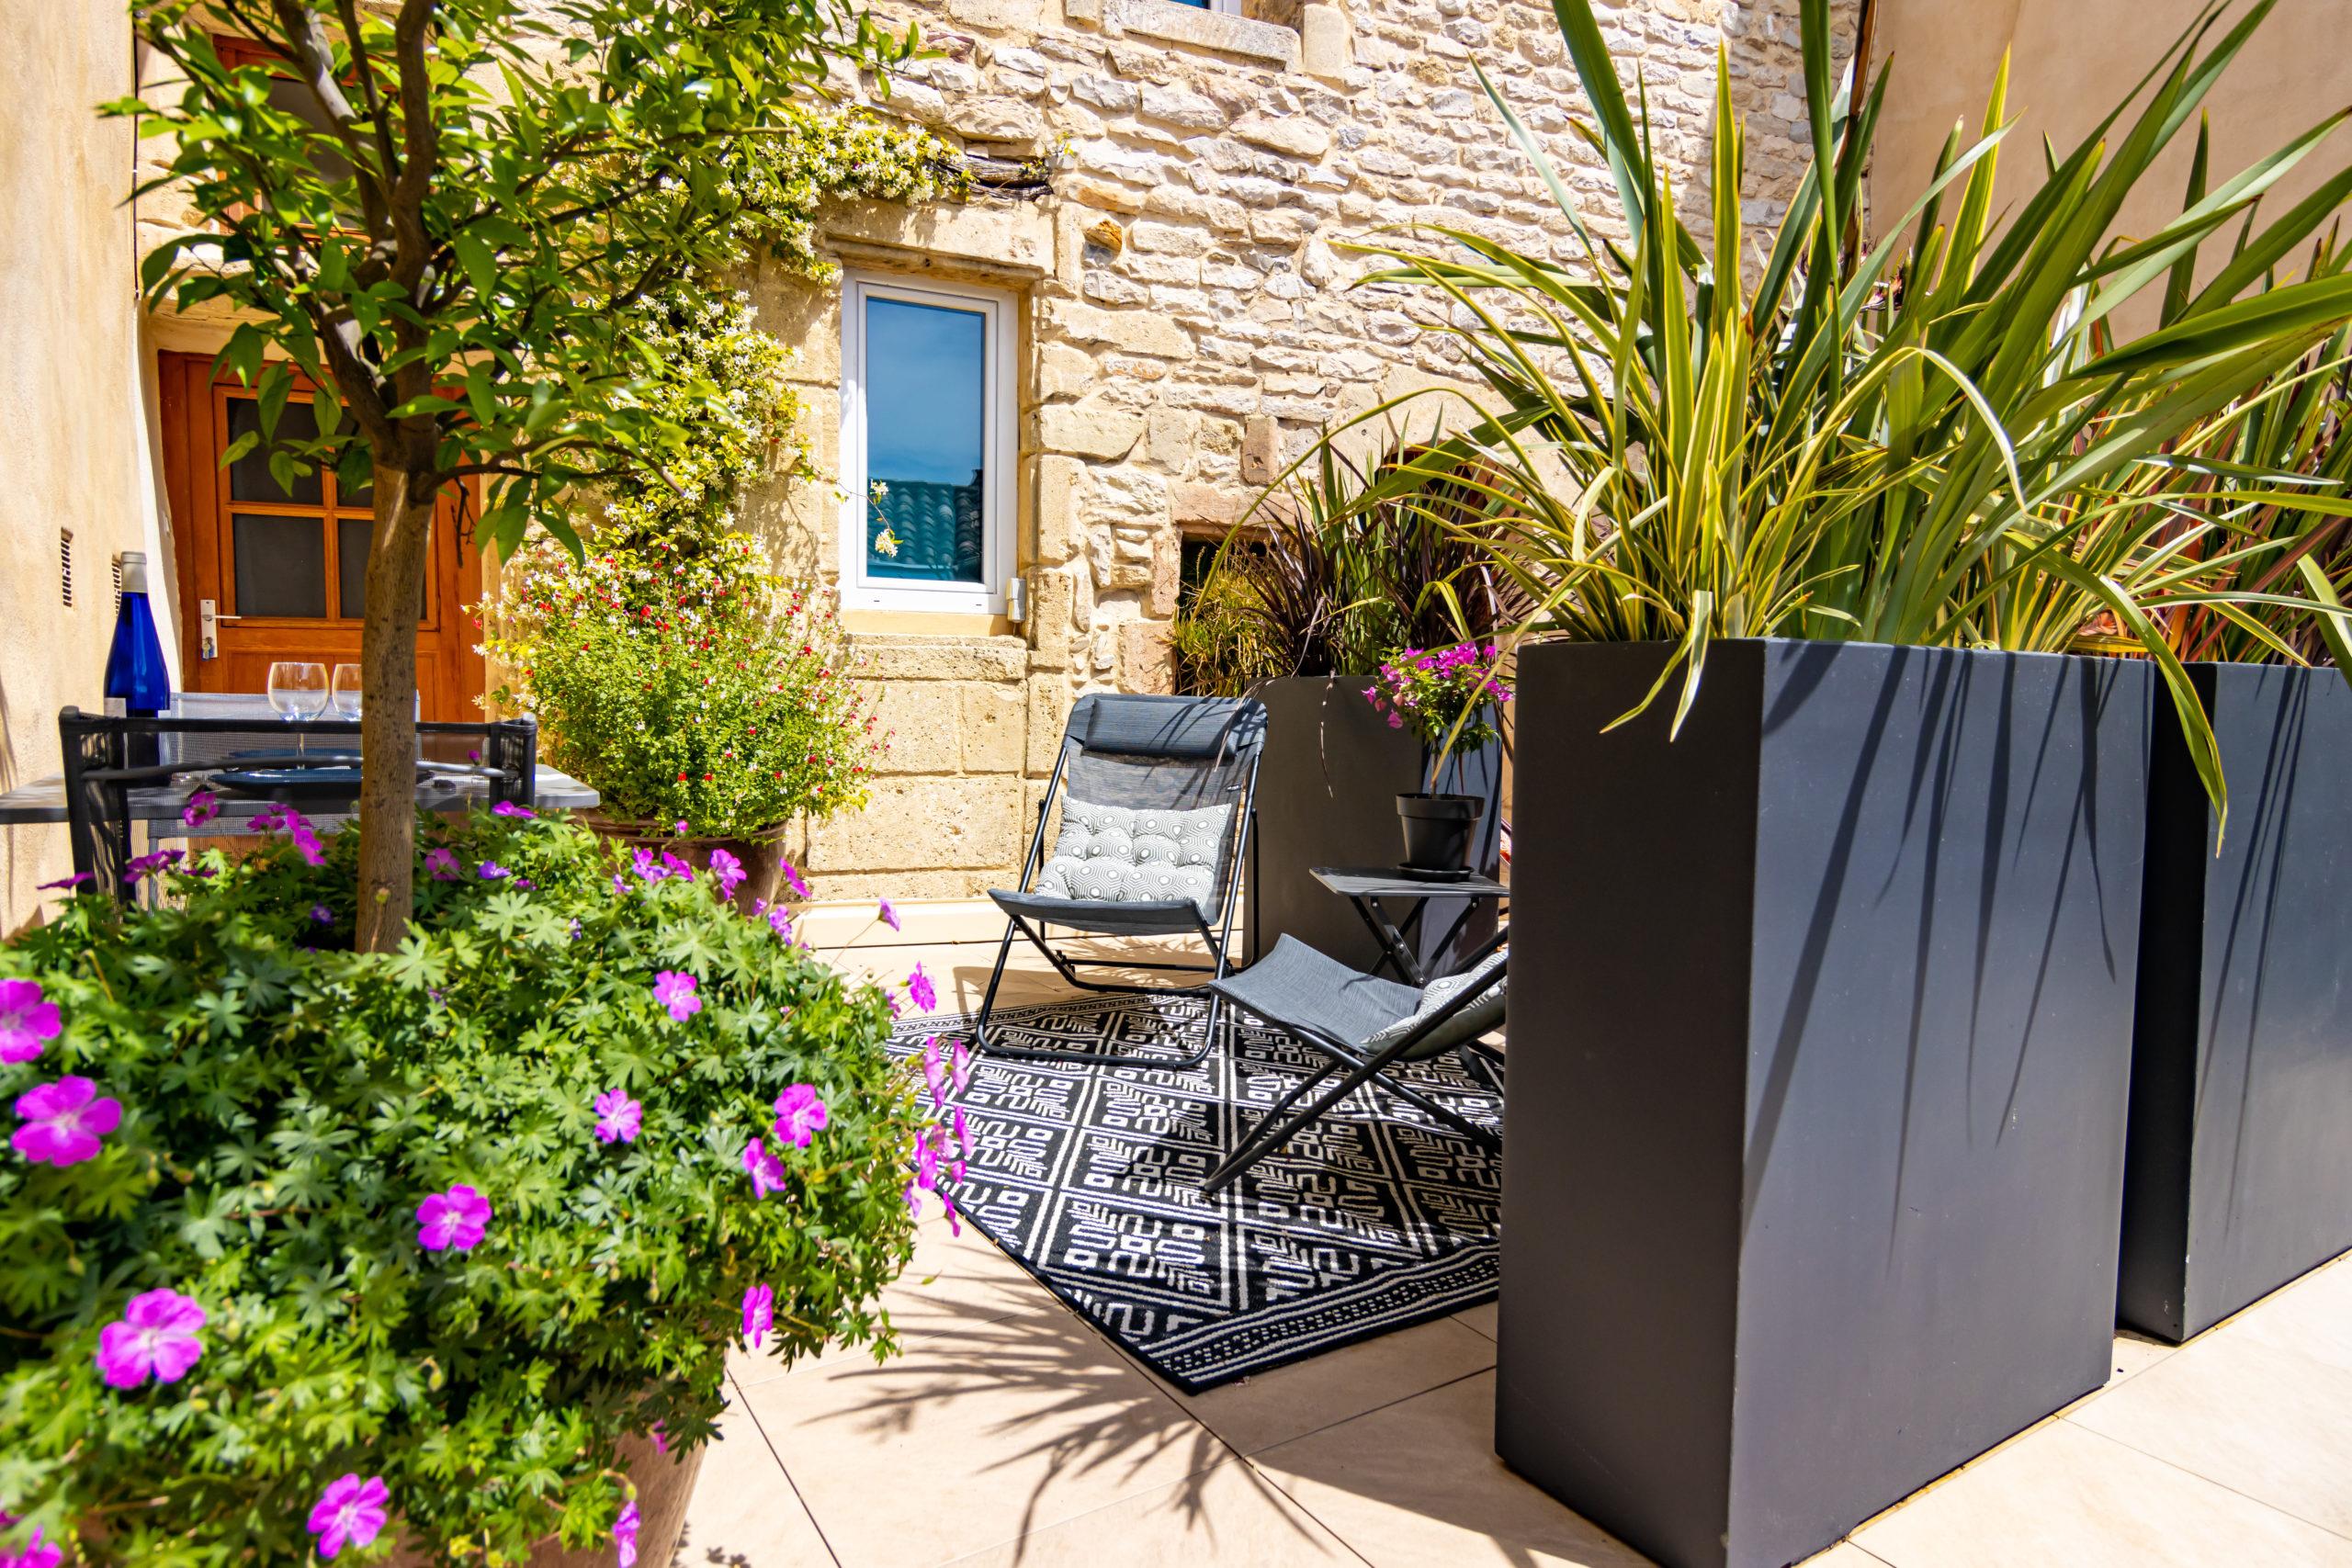 La Vermeillade : location d'appartements dans le Gard